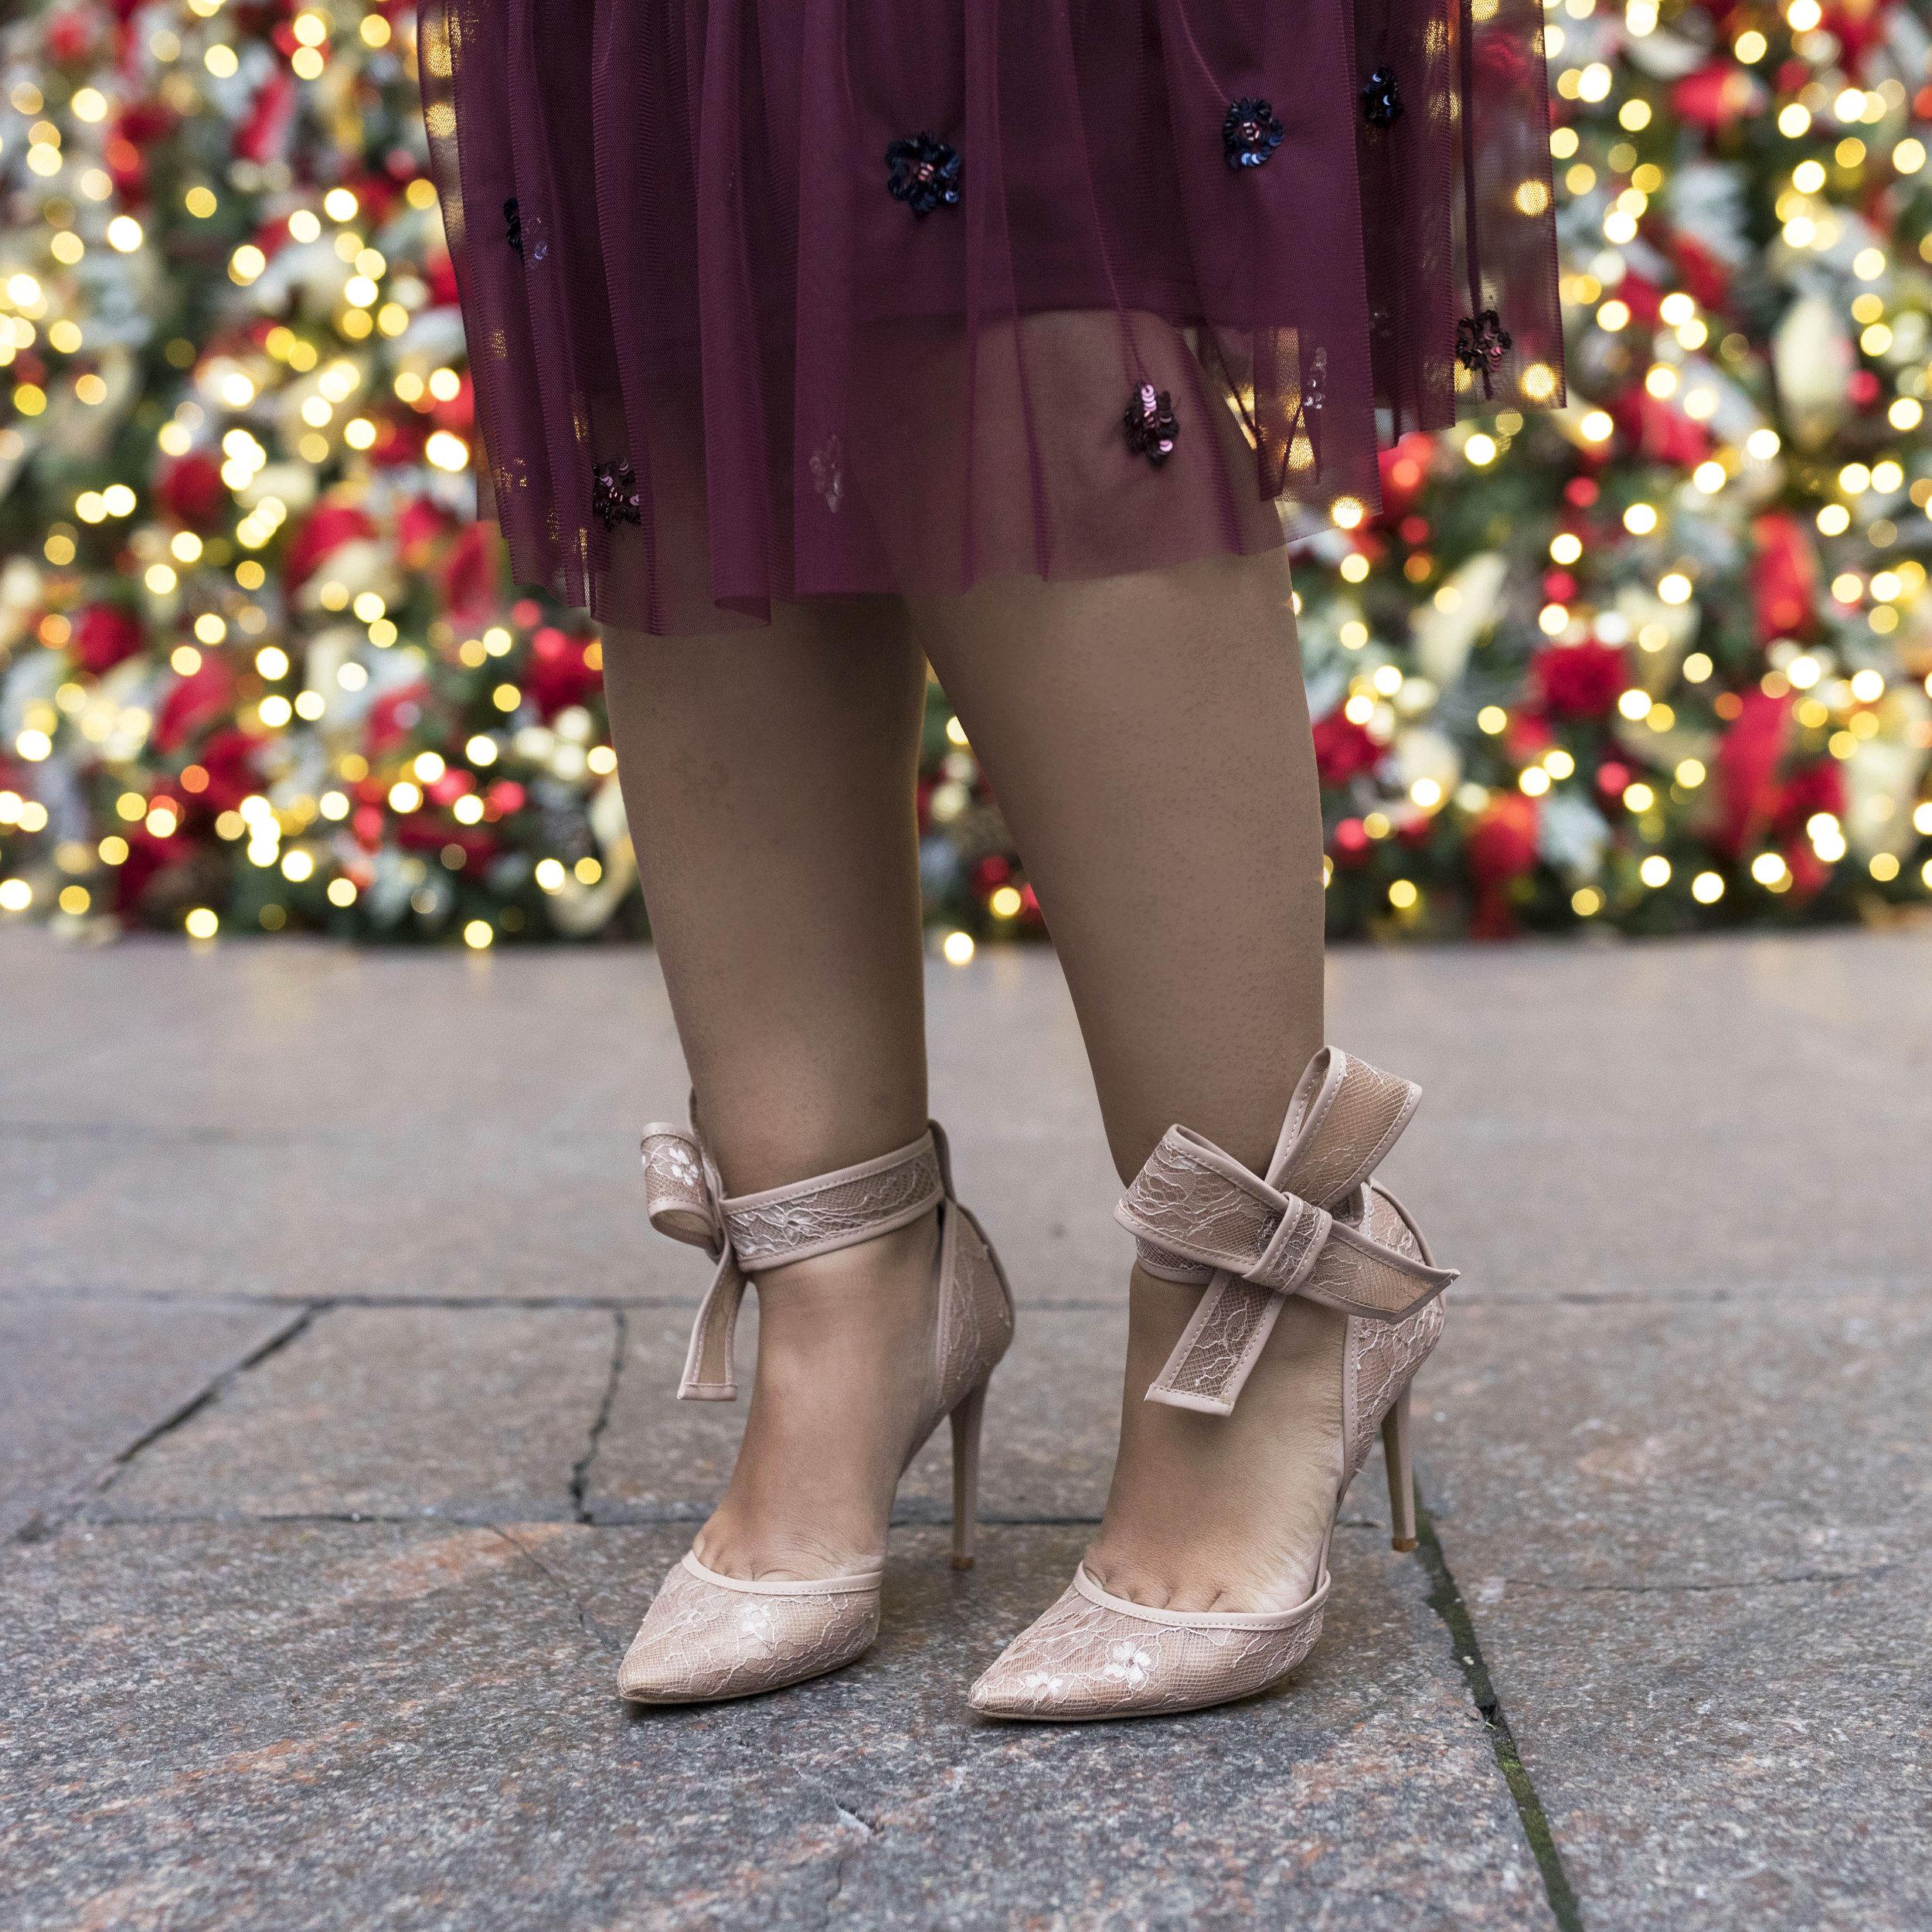 Krity S x Holiday Outfit x Aidan Beaded Burgundy Short Dress14.jpg